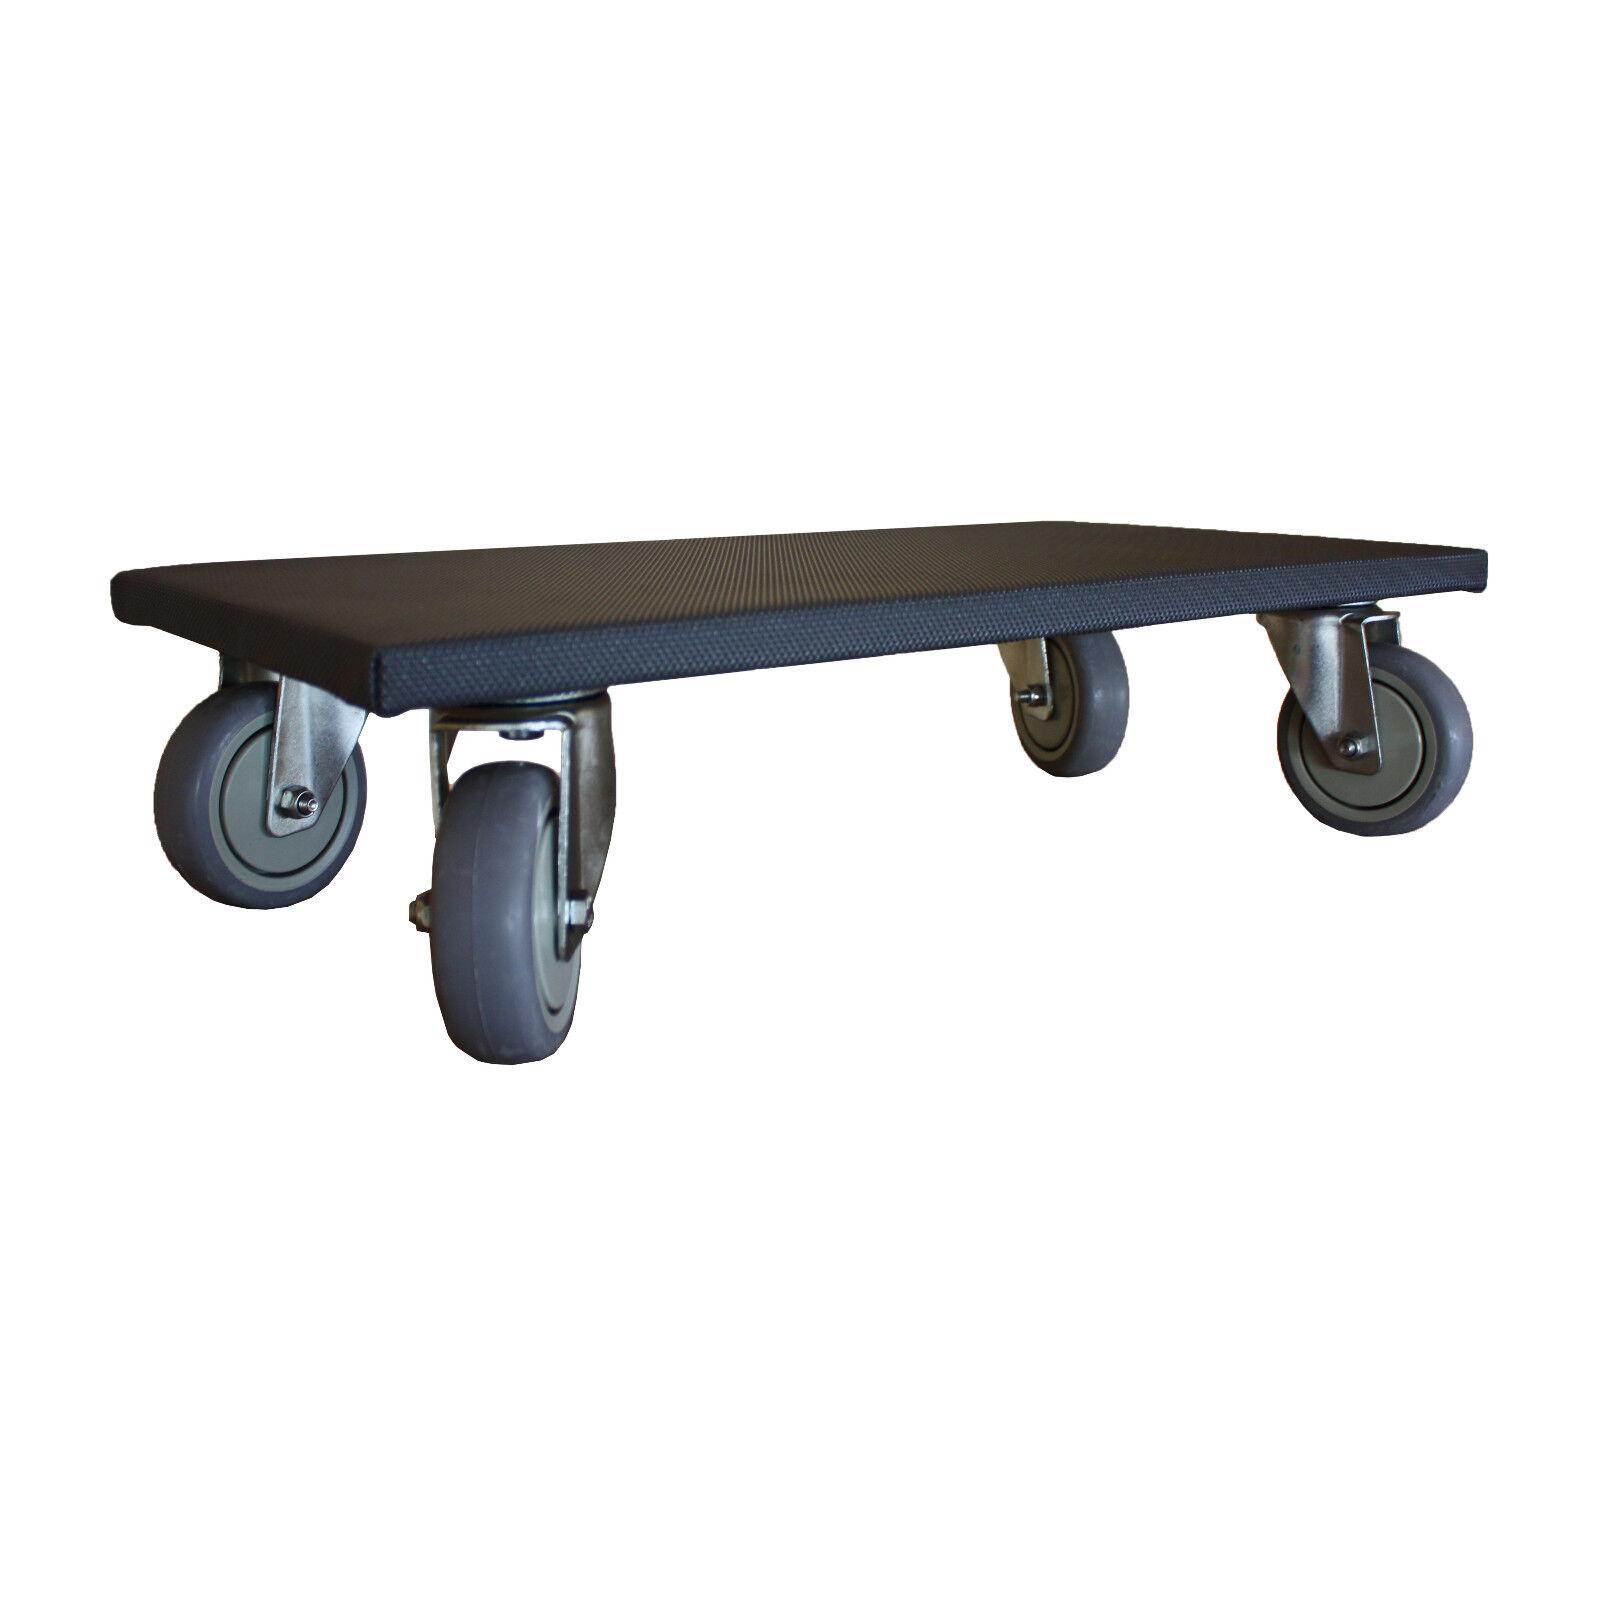 Meubles 600x350 roller 600x350 Meubles mm Möbelhund transport roller de gris boule entreposés 82c427